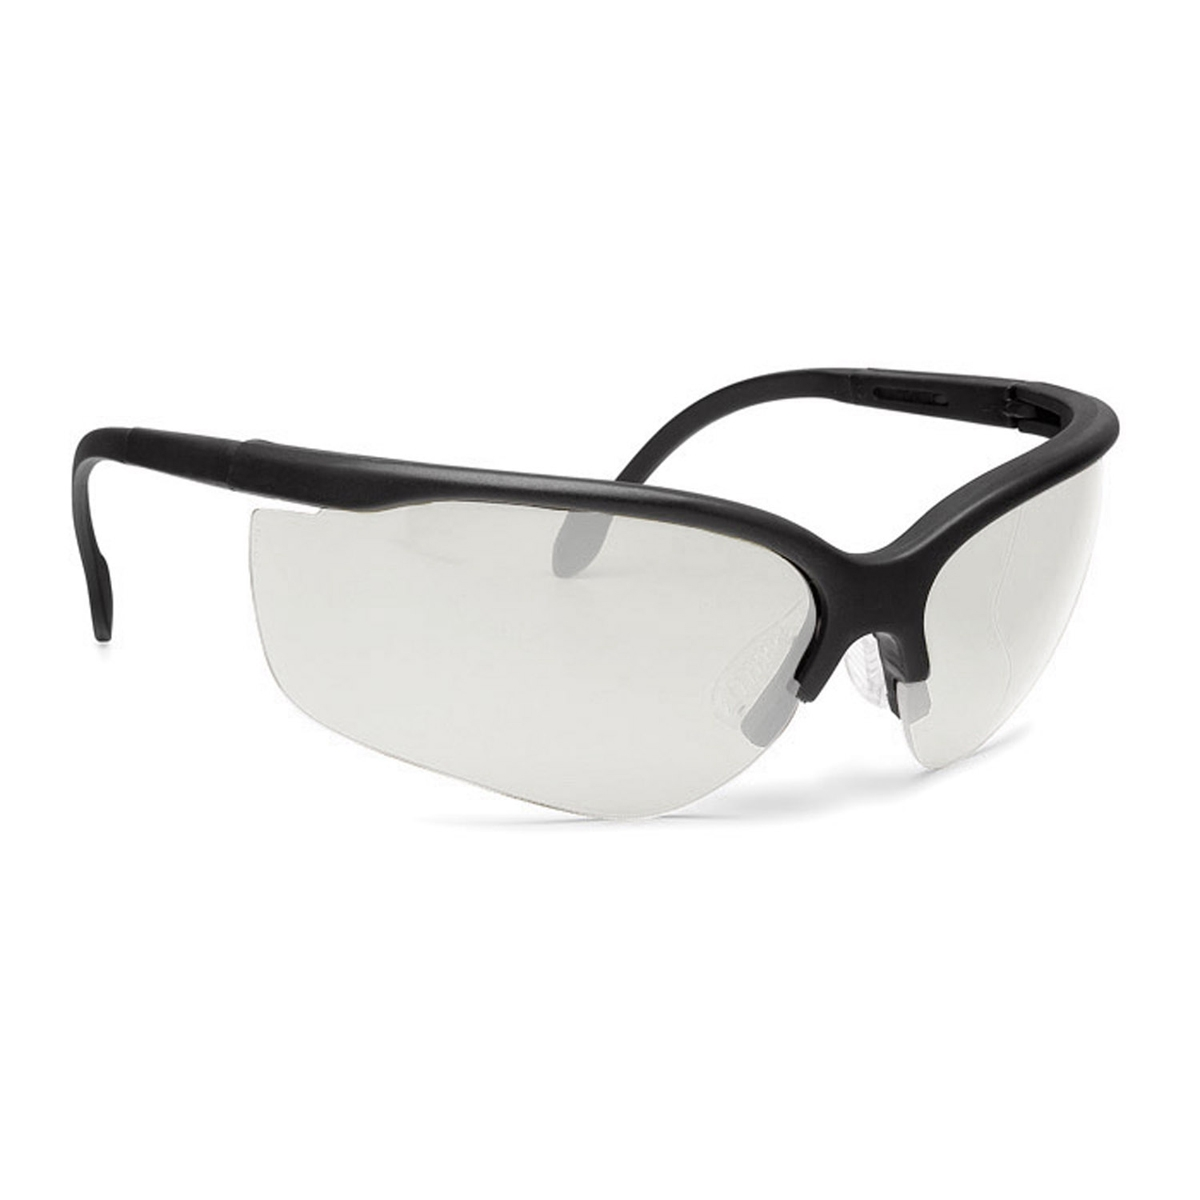 Remington T-40 Safety Glasses - Black Frame - Clear Lens ...